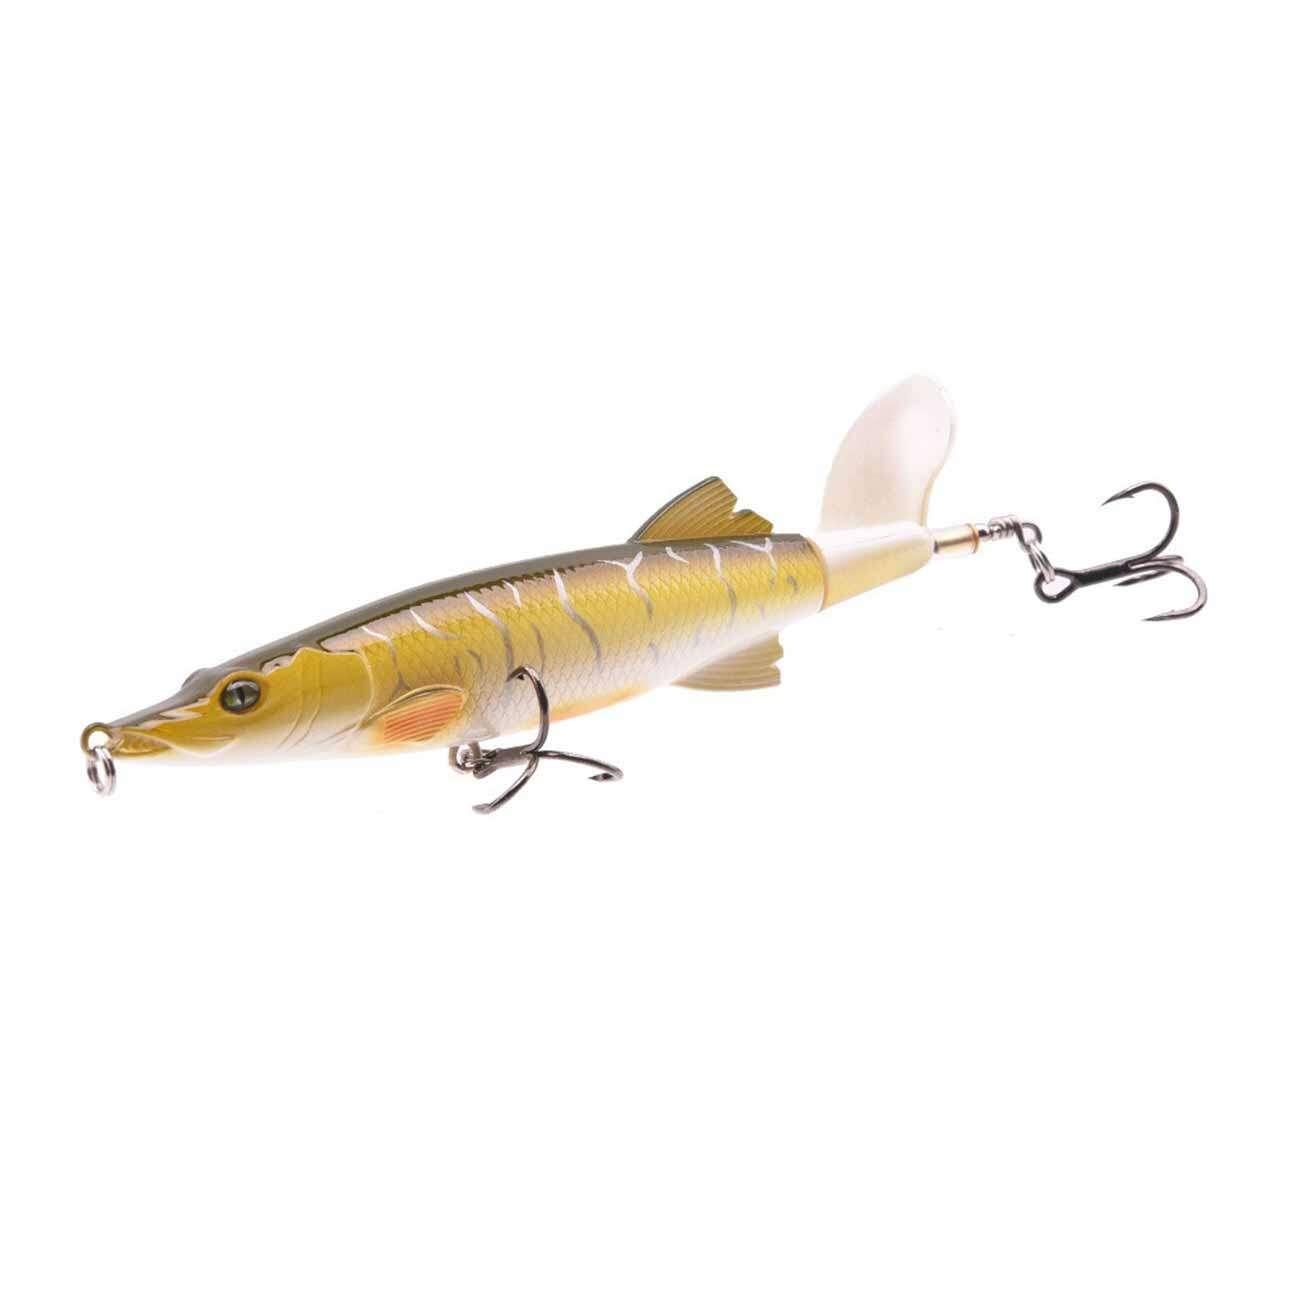 20pcs Grub Worm Soft Plastic Lure Fishing Tackle Bait Drop Shot Jig Head 7.5cm